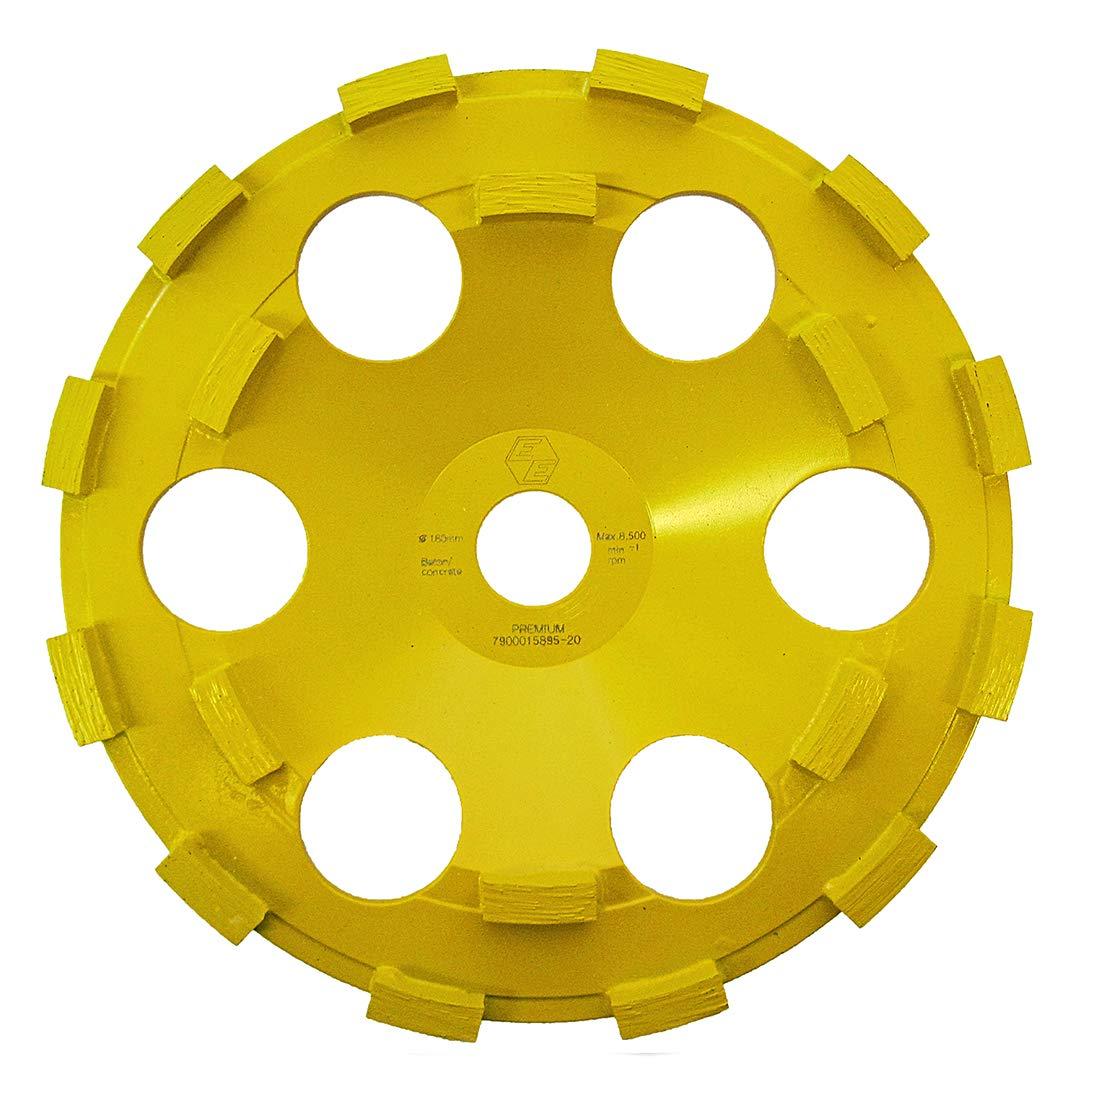 CS Unitec 37114 Grinding Wheel for The EBS 1802.1 Premium